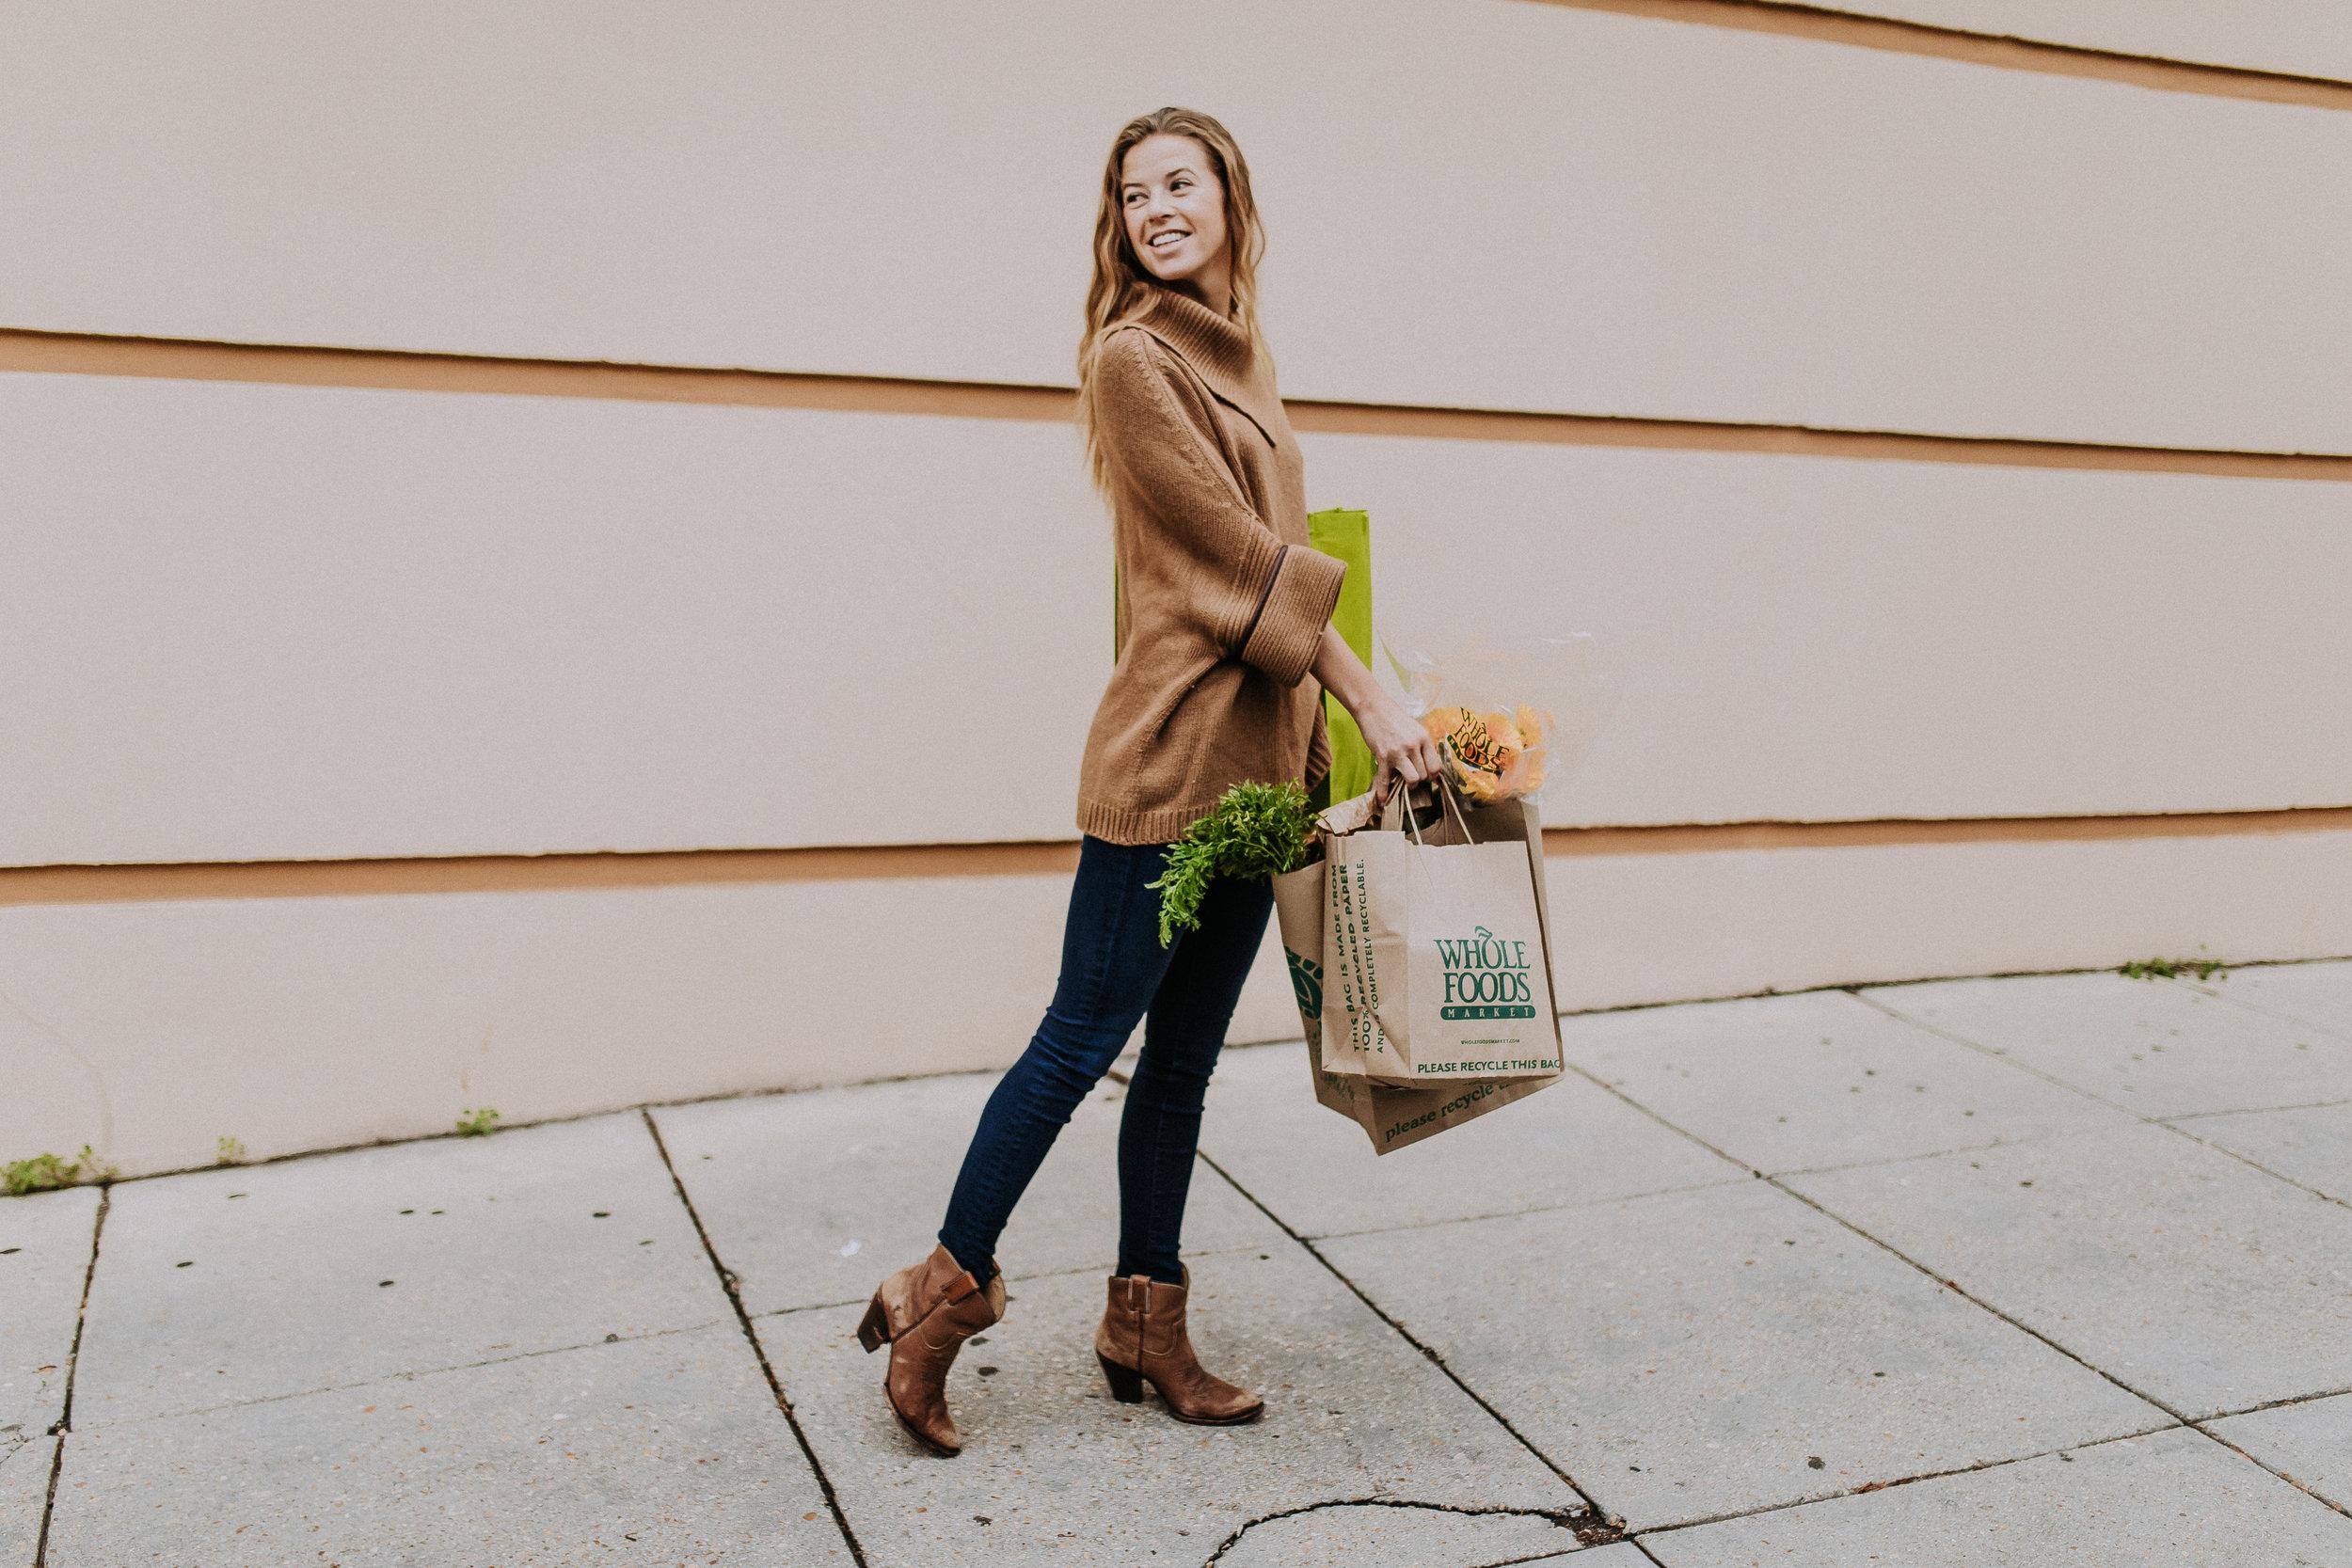 millennial_shopper_whole_foods